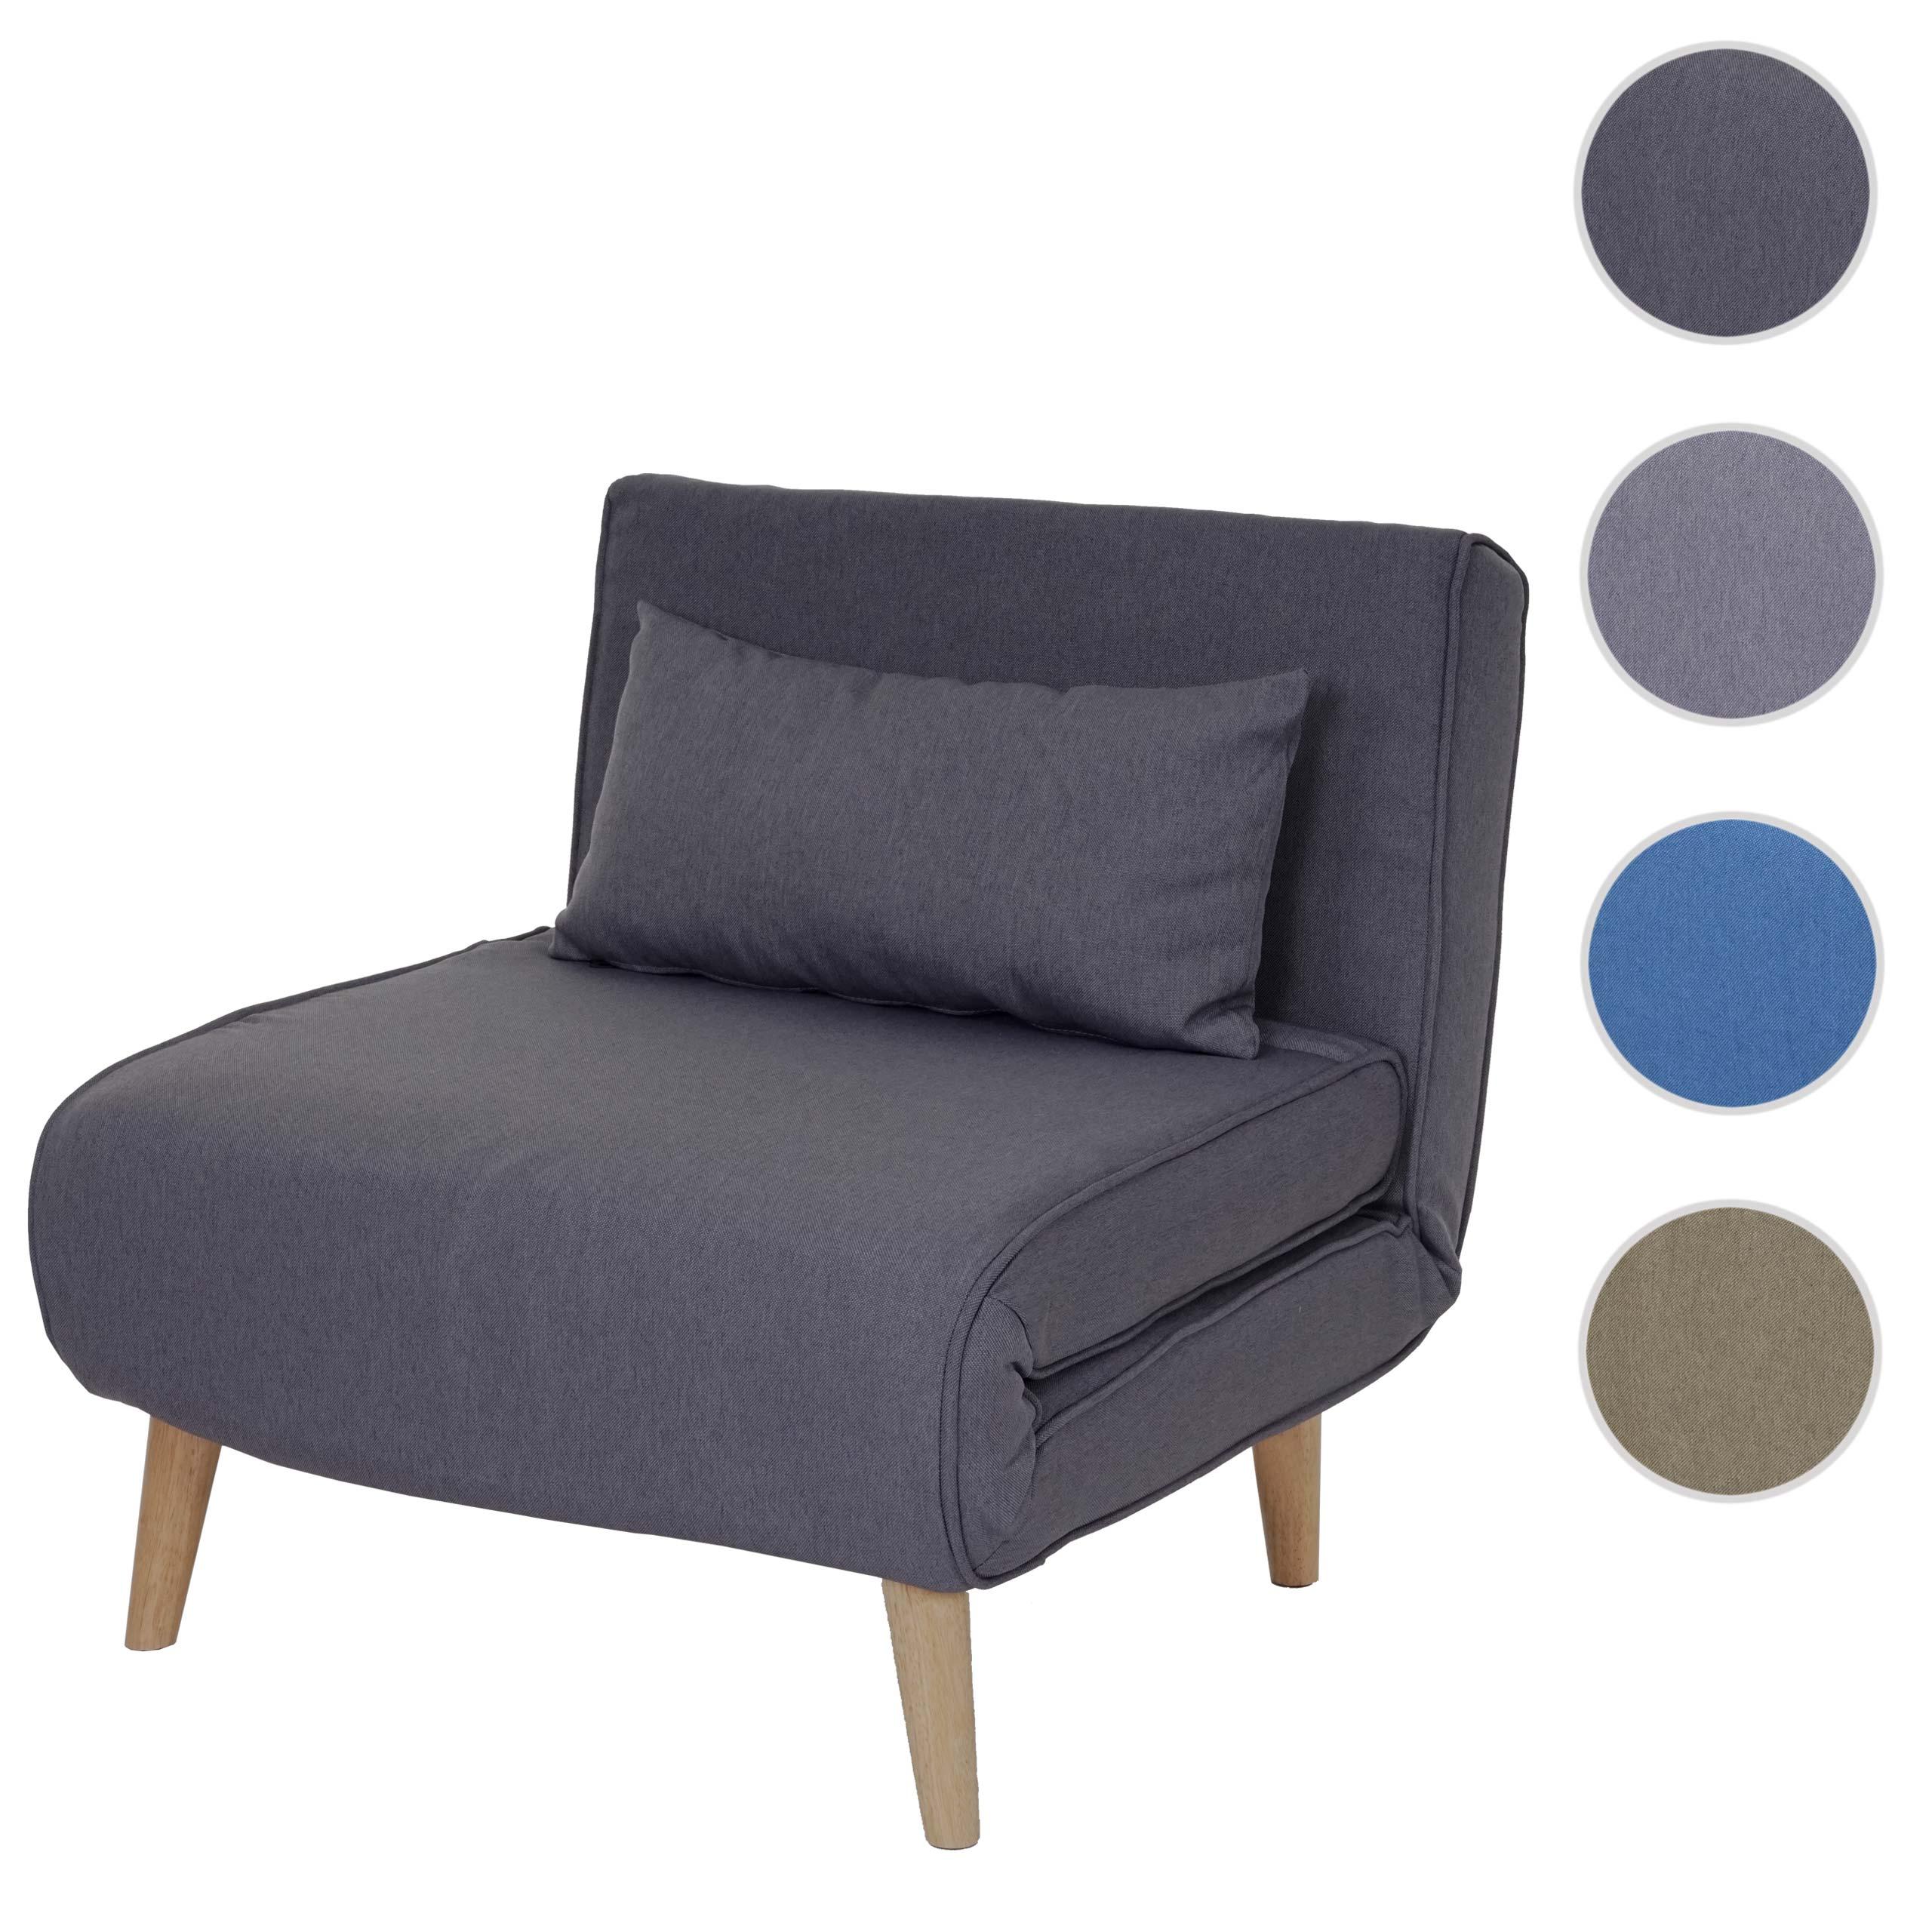 Mendler Schlafsessel HWC-D35, Schlafsofa Funktionssessel Klappsessel Relaxsessel Jugendsessel Sessel, Stoff/ 62744